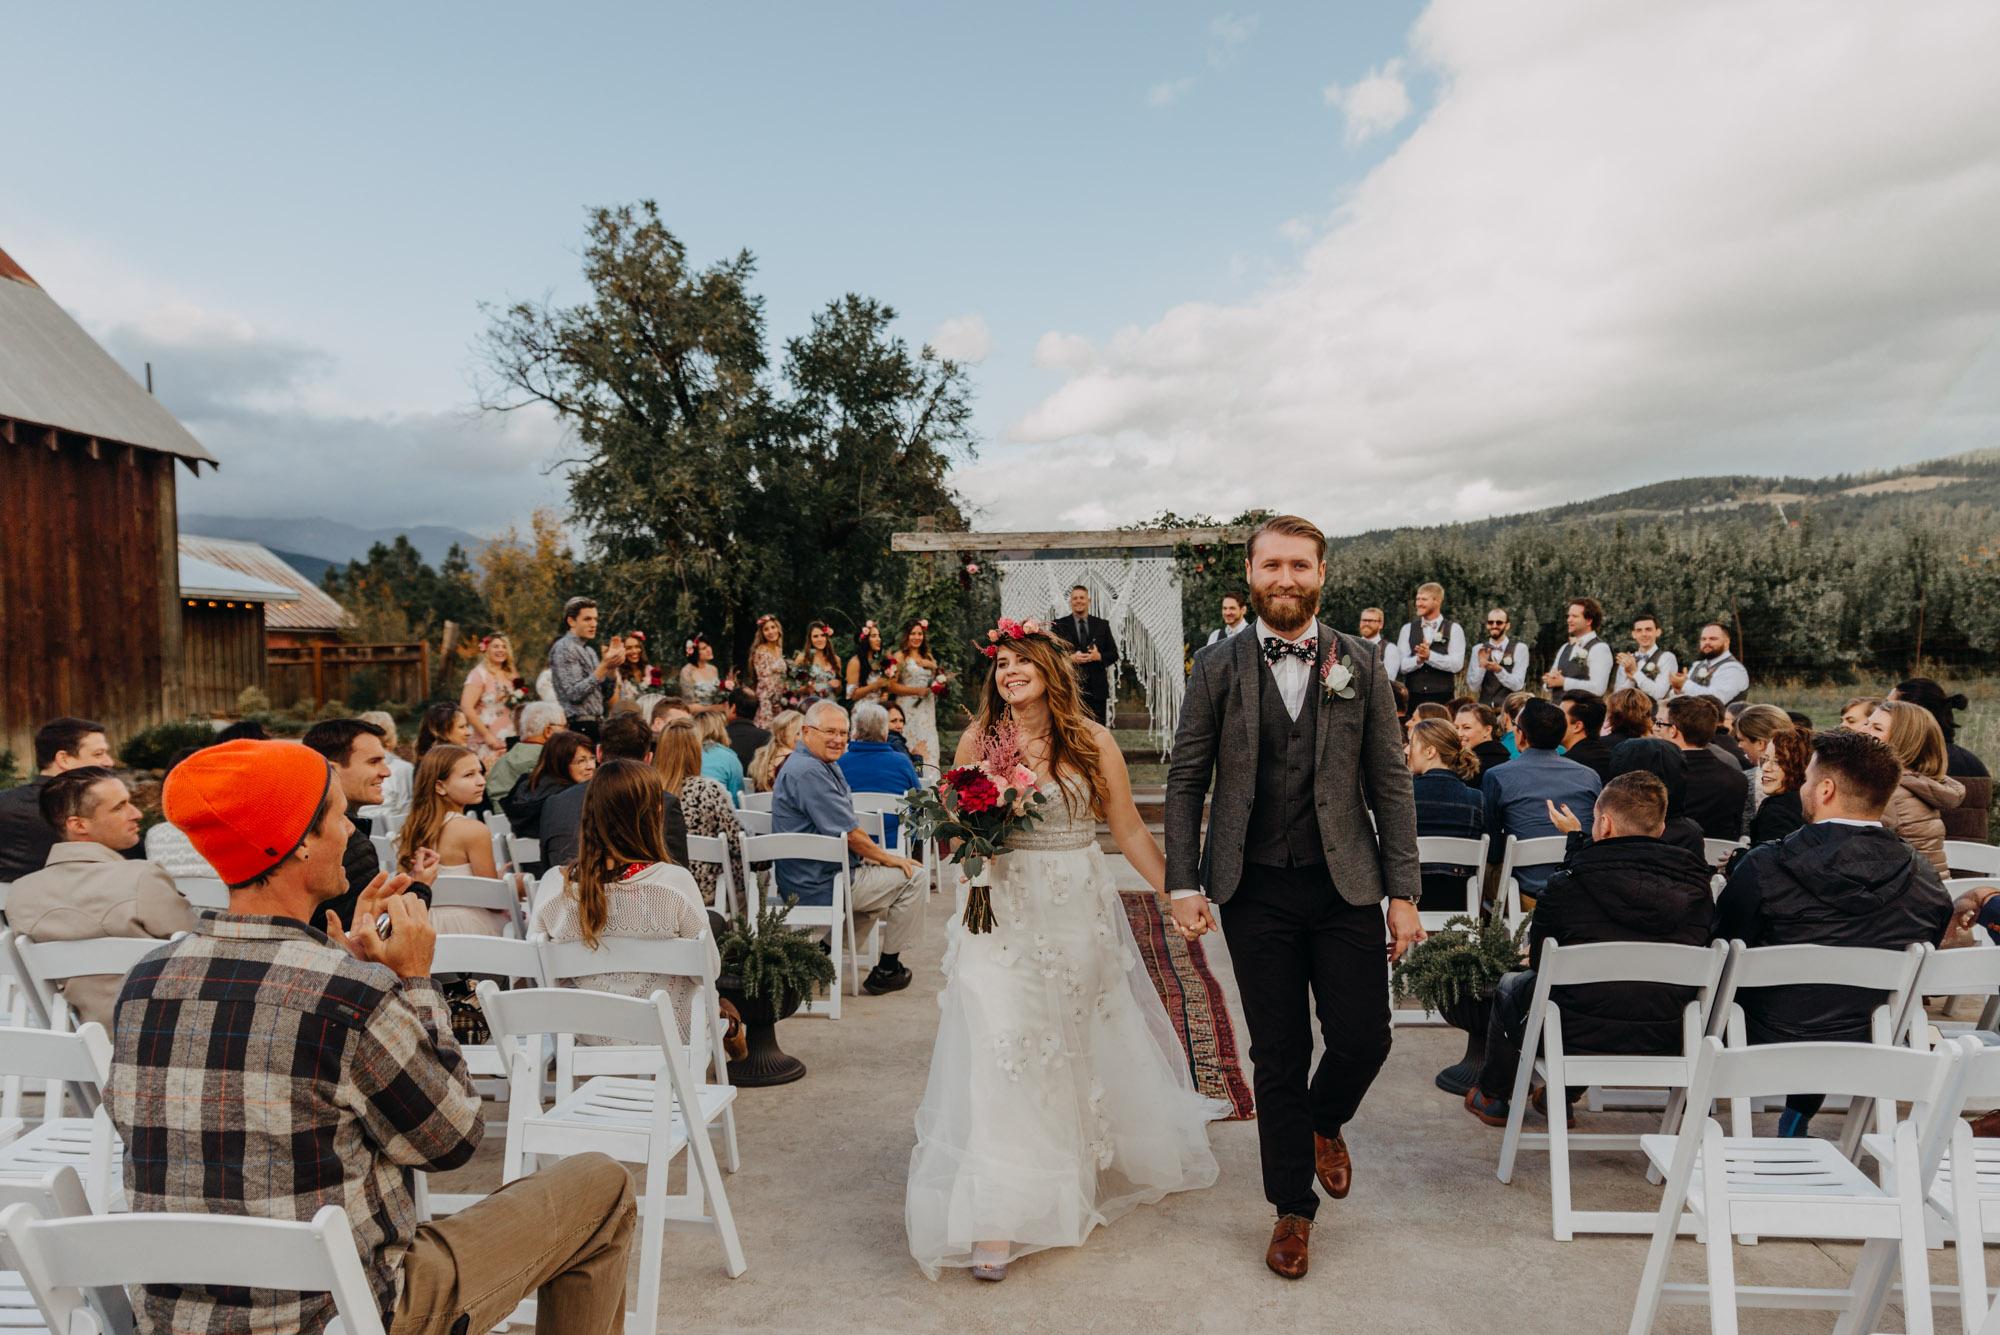 Outdoor-Summer-Ceremony-Washington-Wedding-Rainbow-5450.jpg